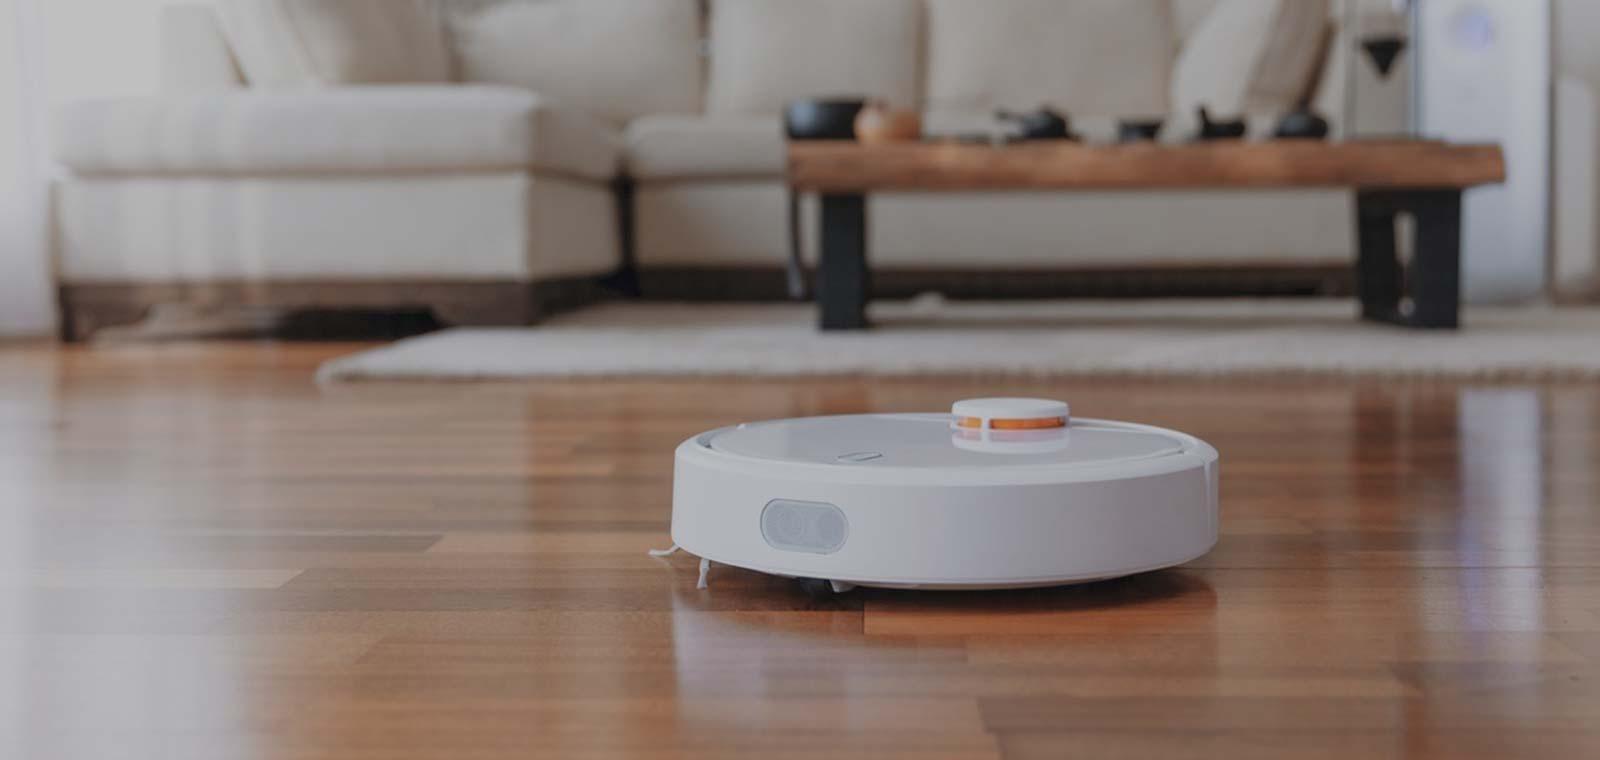 Smart Home Gadgets best smart home gadgets - october 2017 - gadget flow